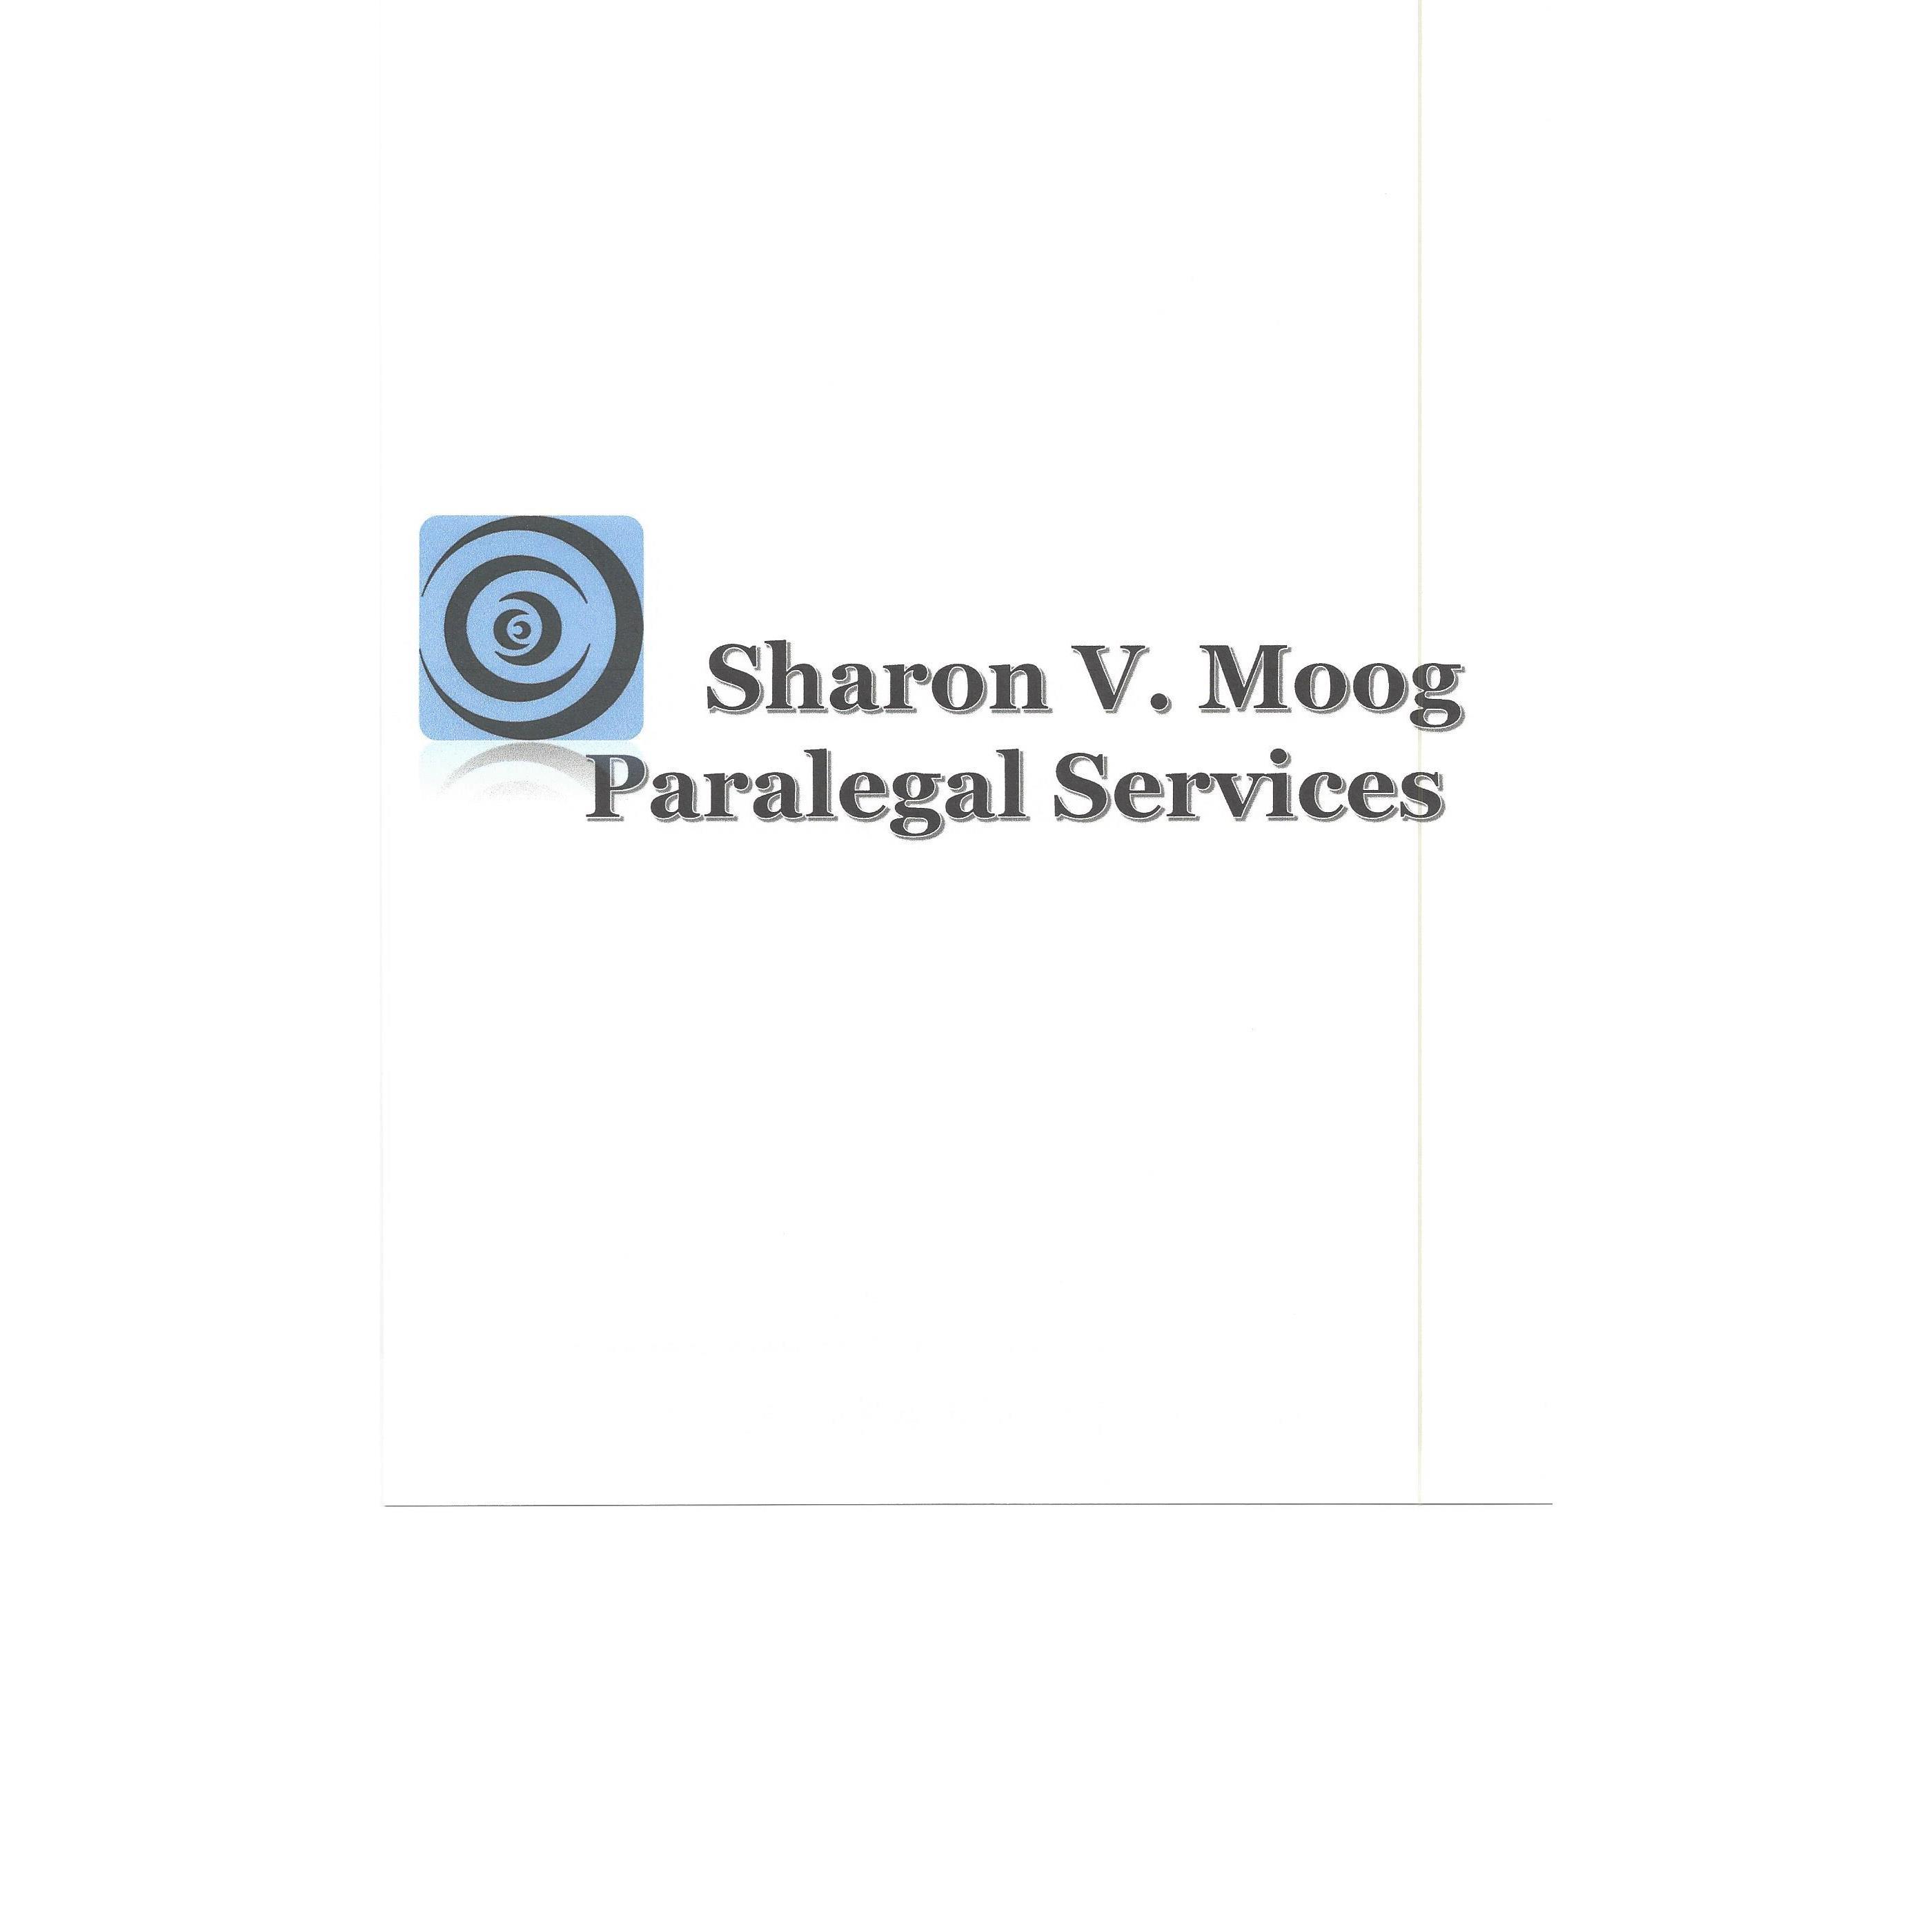 Sharon V Moog Paralegal Services